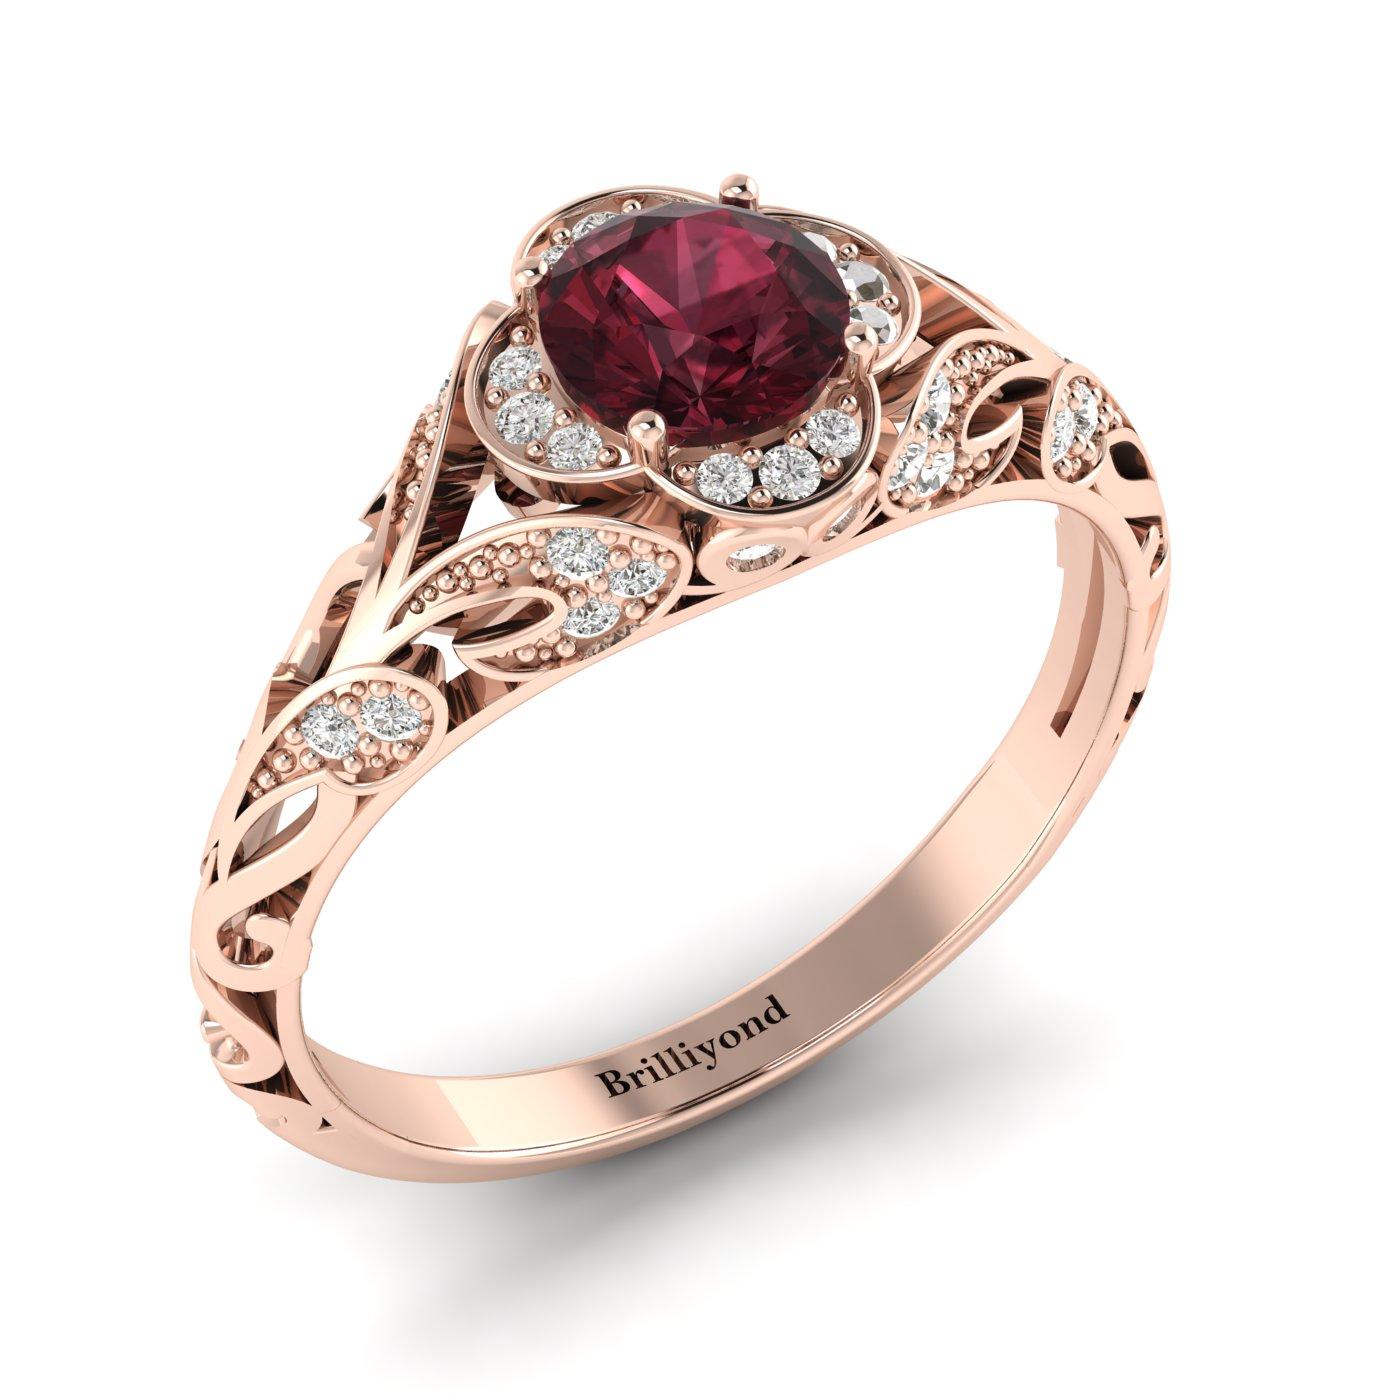 Garnet Rose Gold Vintage Engagement Ring Country Road_image2